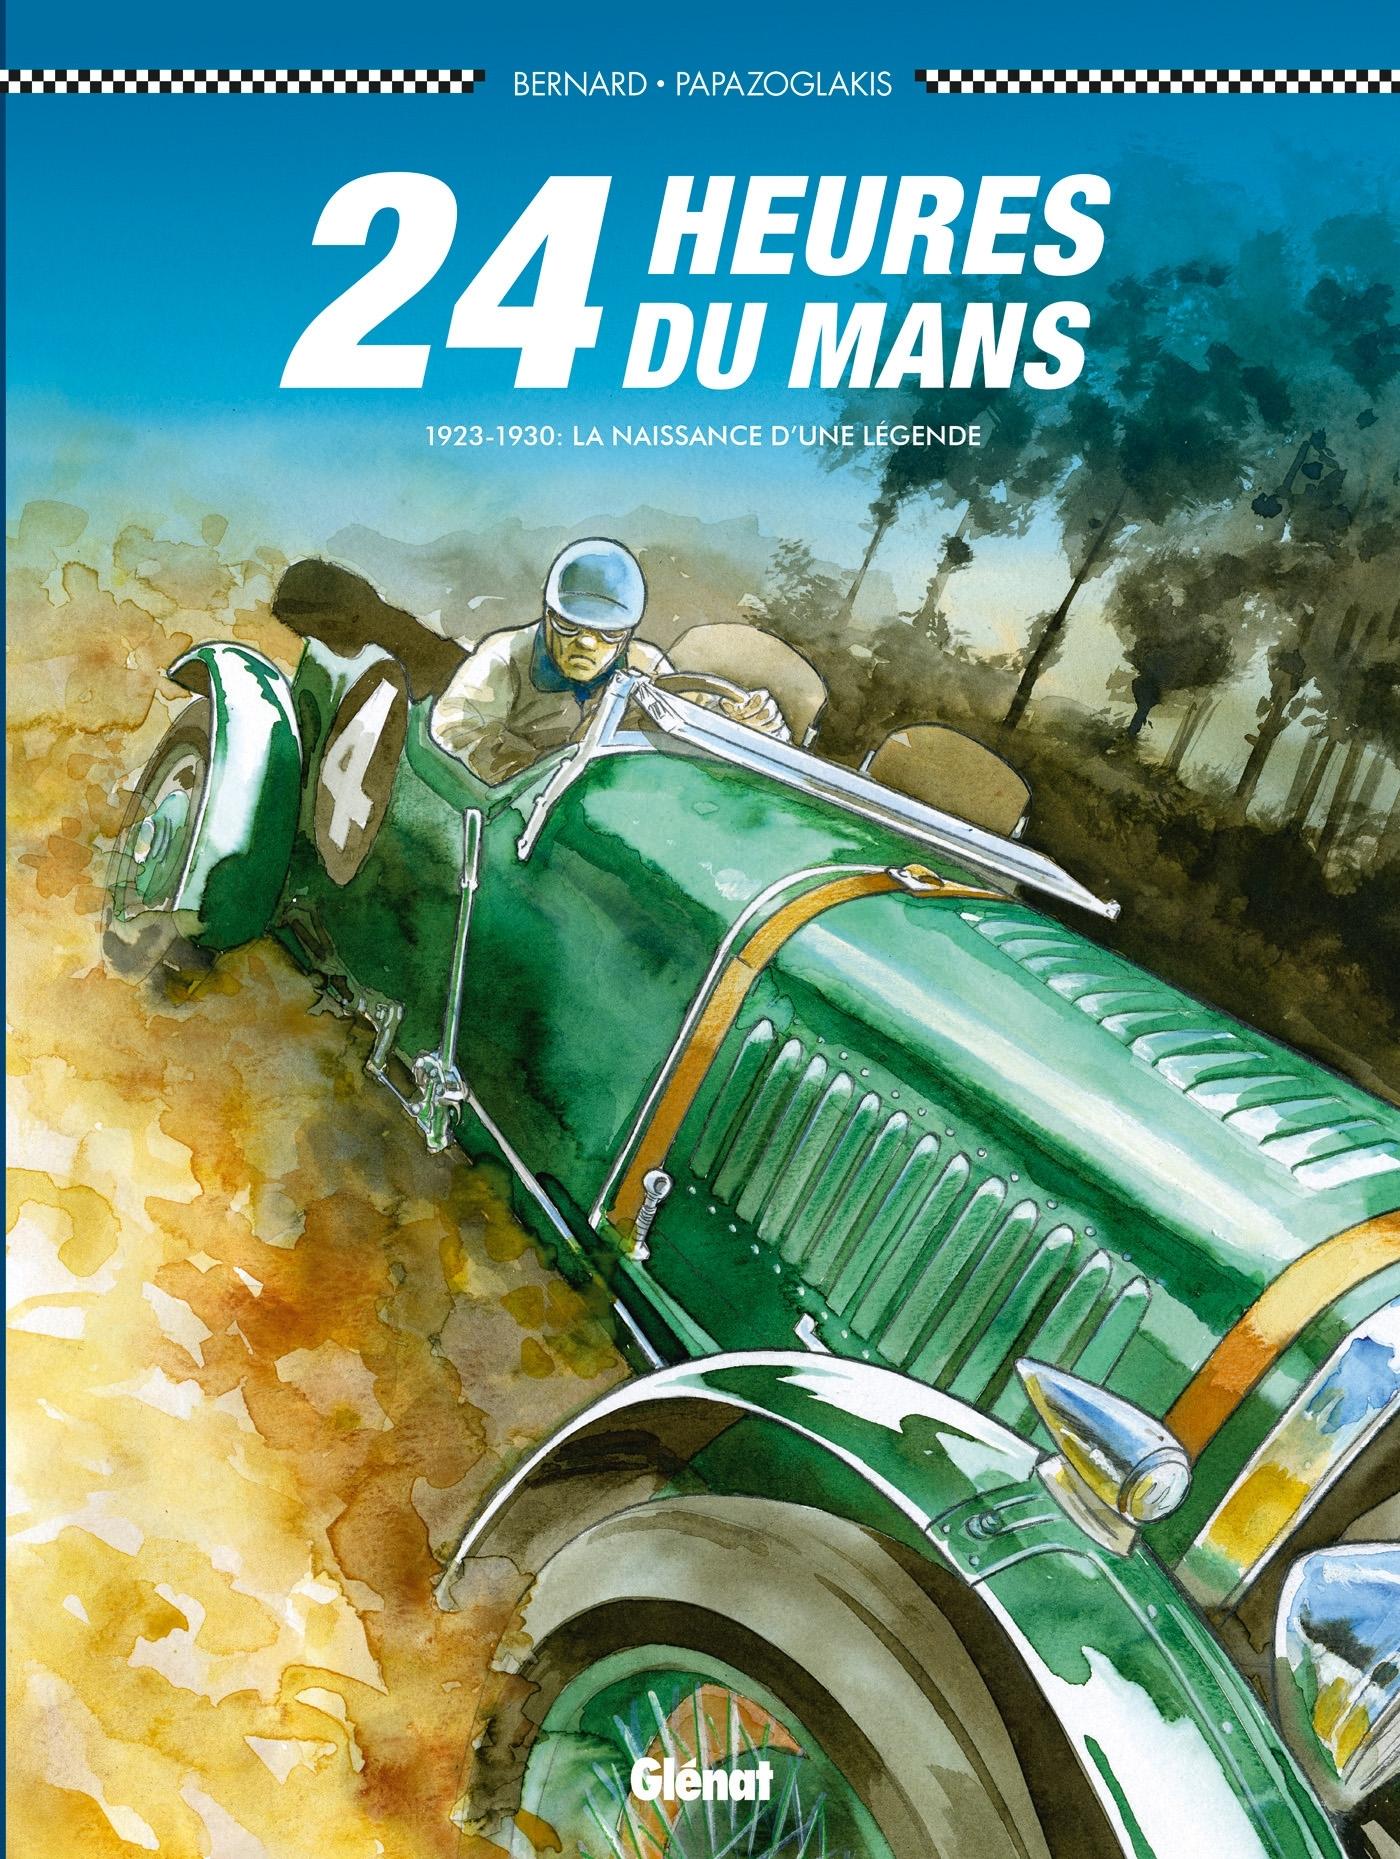 24 HEURES DU MANS - 1923-1930 - LES BENTLEY BOYS